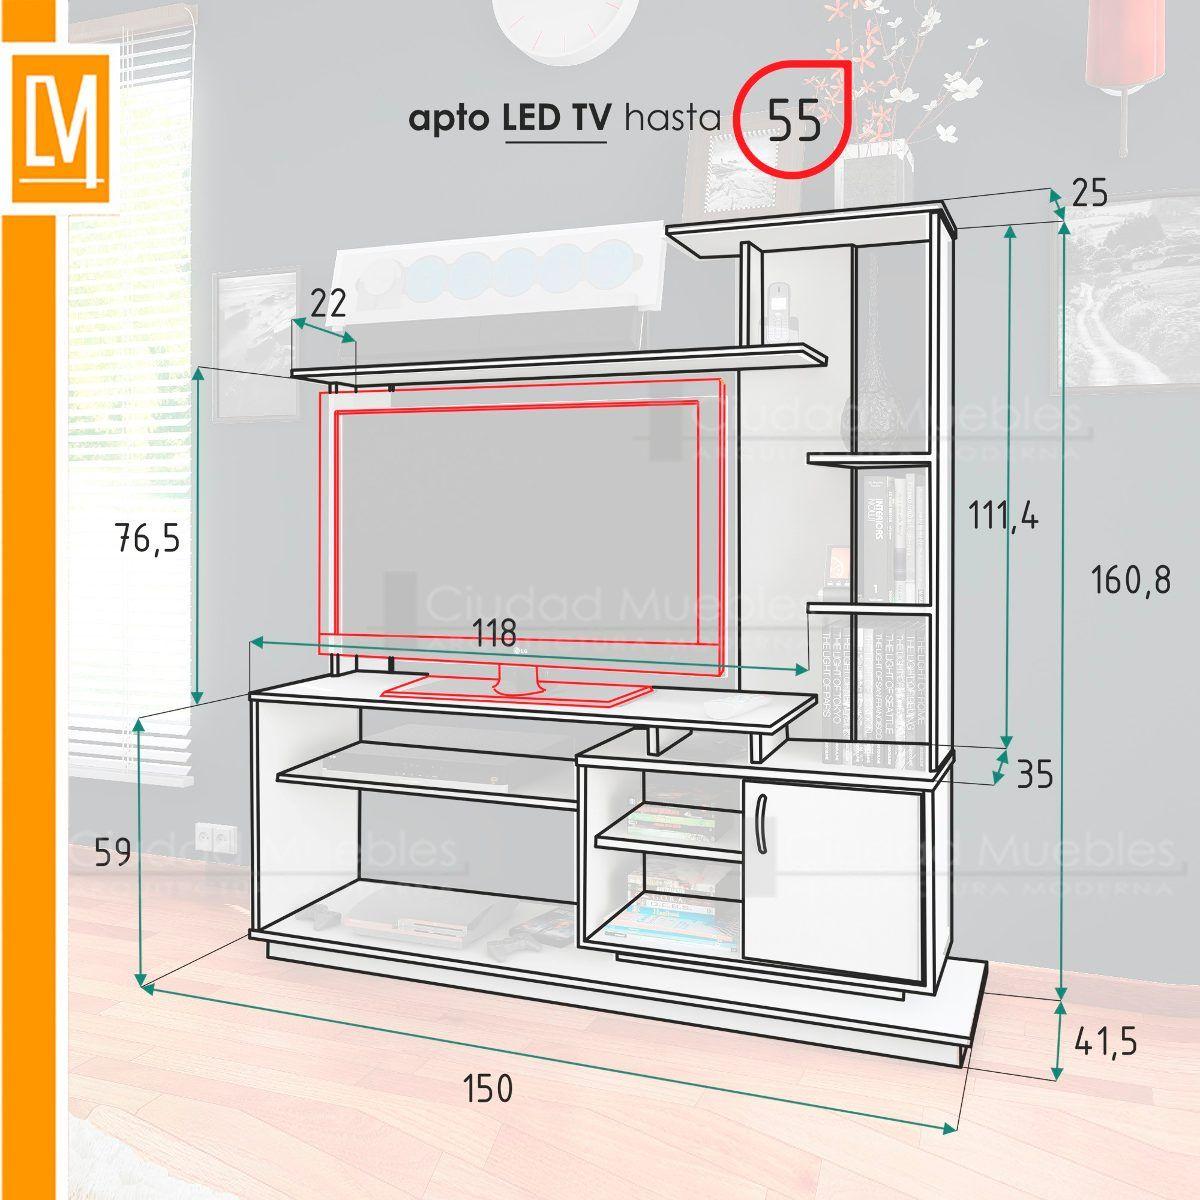 Muebles de sala de entretenimiento buscar con google for Guia mecanica de cocina pdf